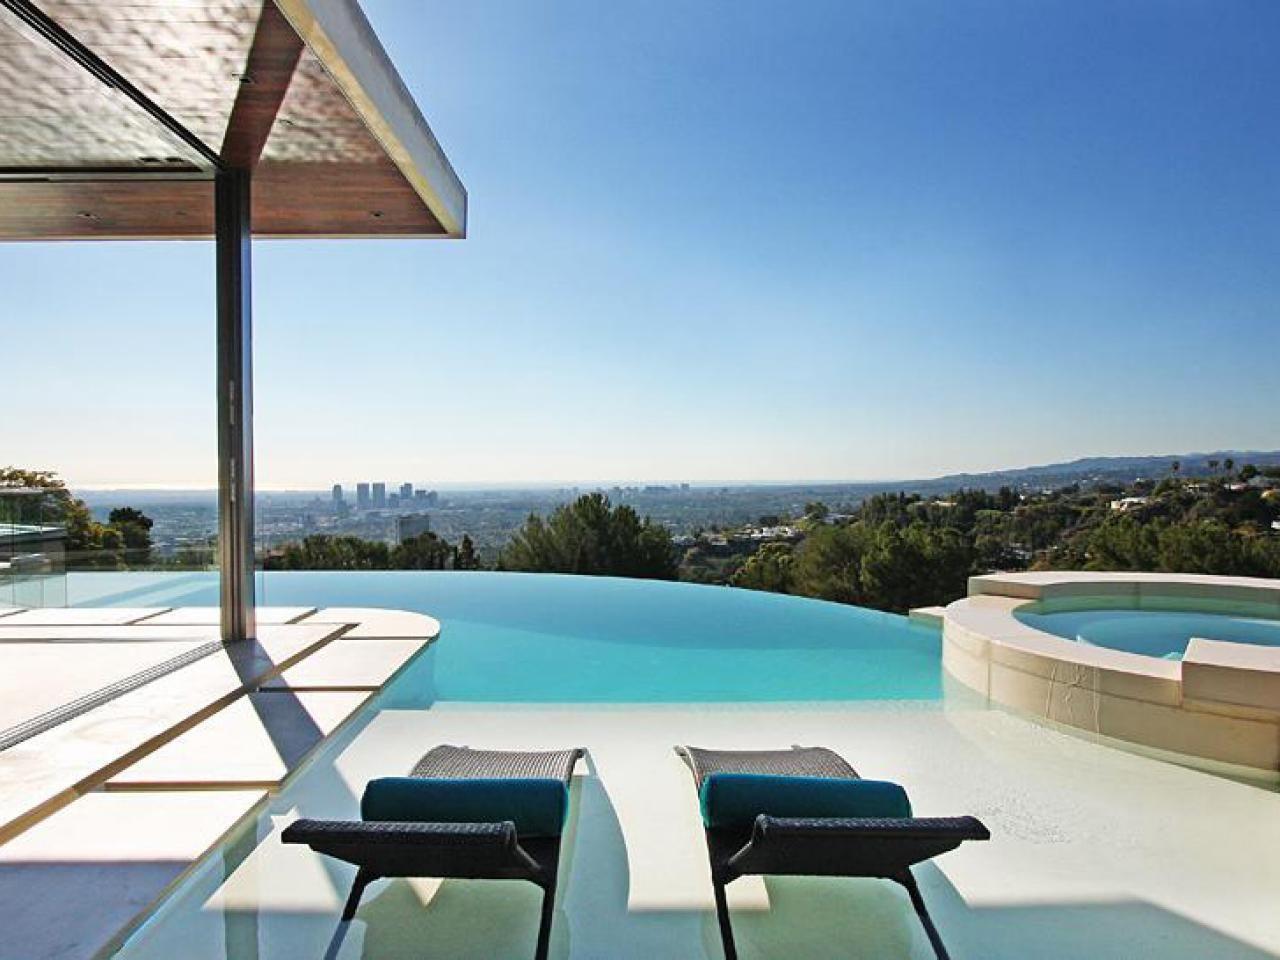 On The Edge: Stunning Infinity Pools